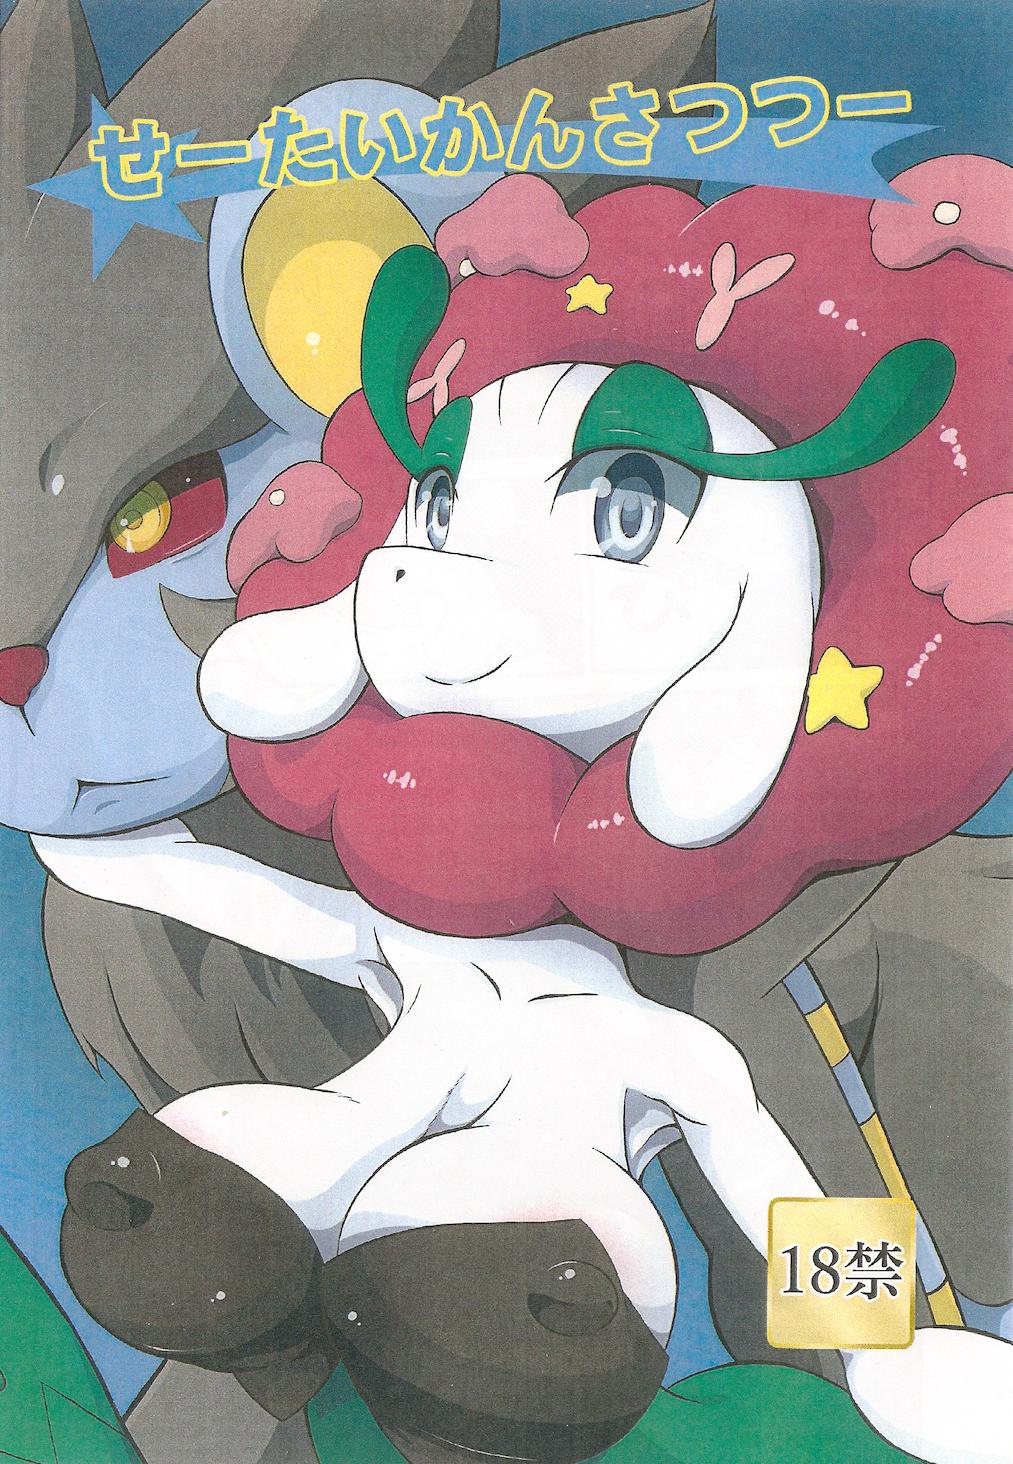 Seetai kansatsutsuu (Pokemon)